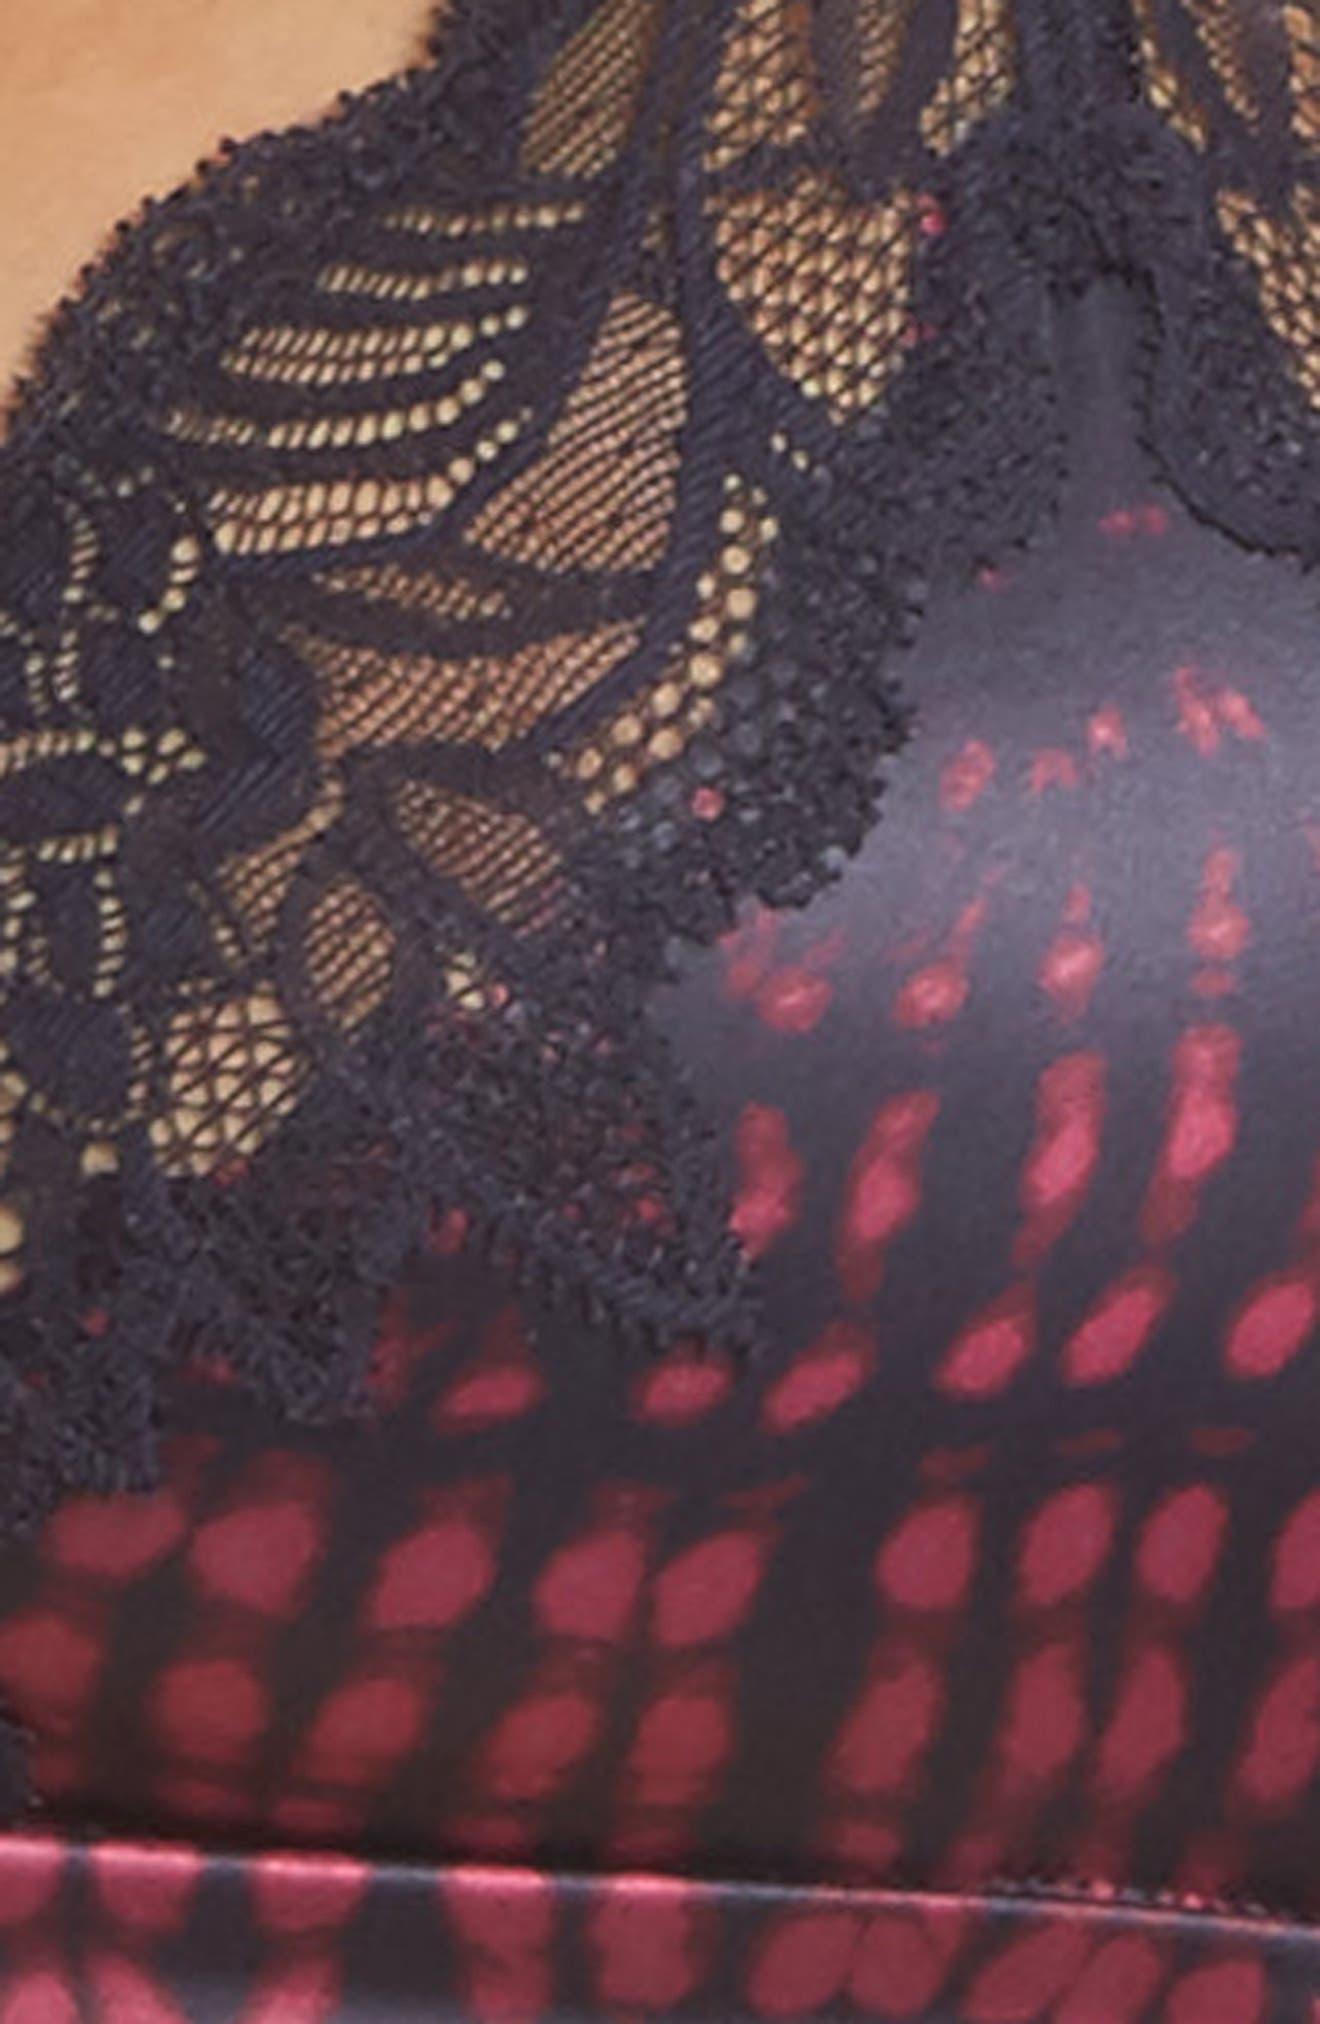 Black Enamored Wireless Triangle Bra,                             Alternate thumbnail 8, color,                             Mysterious Skin/ Flux